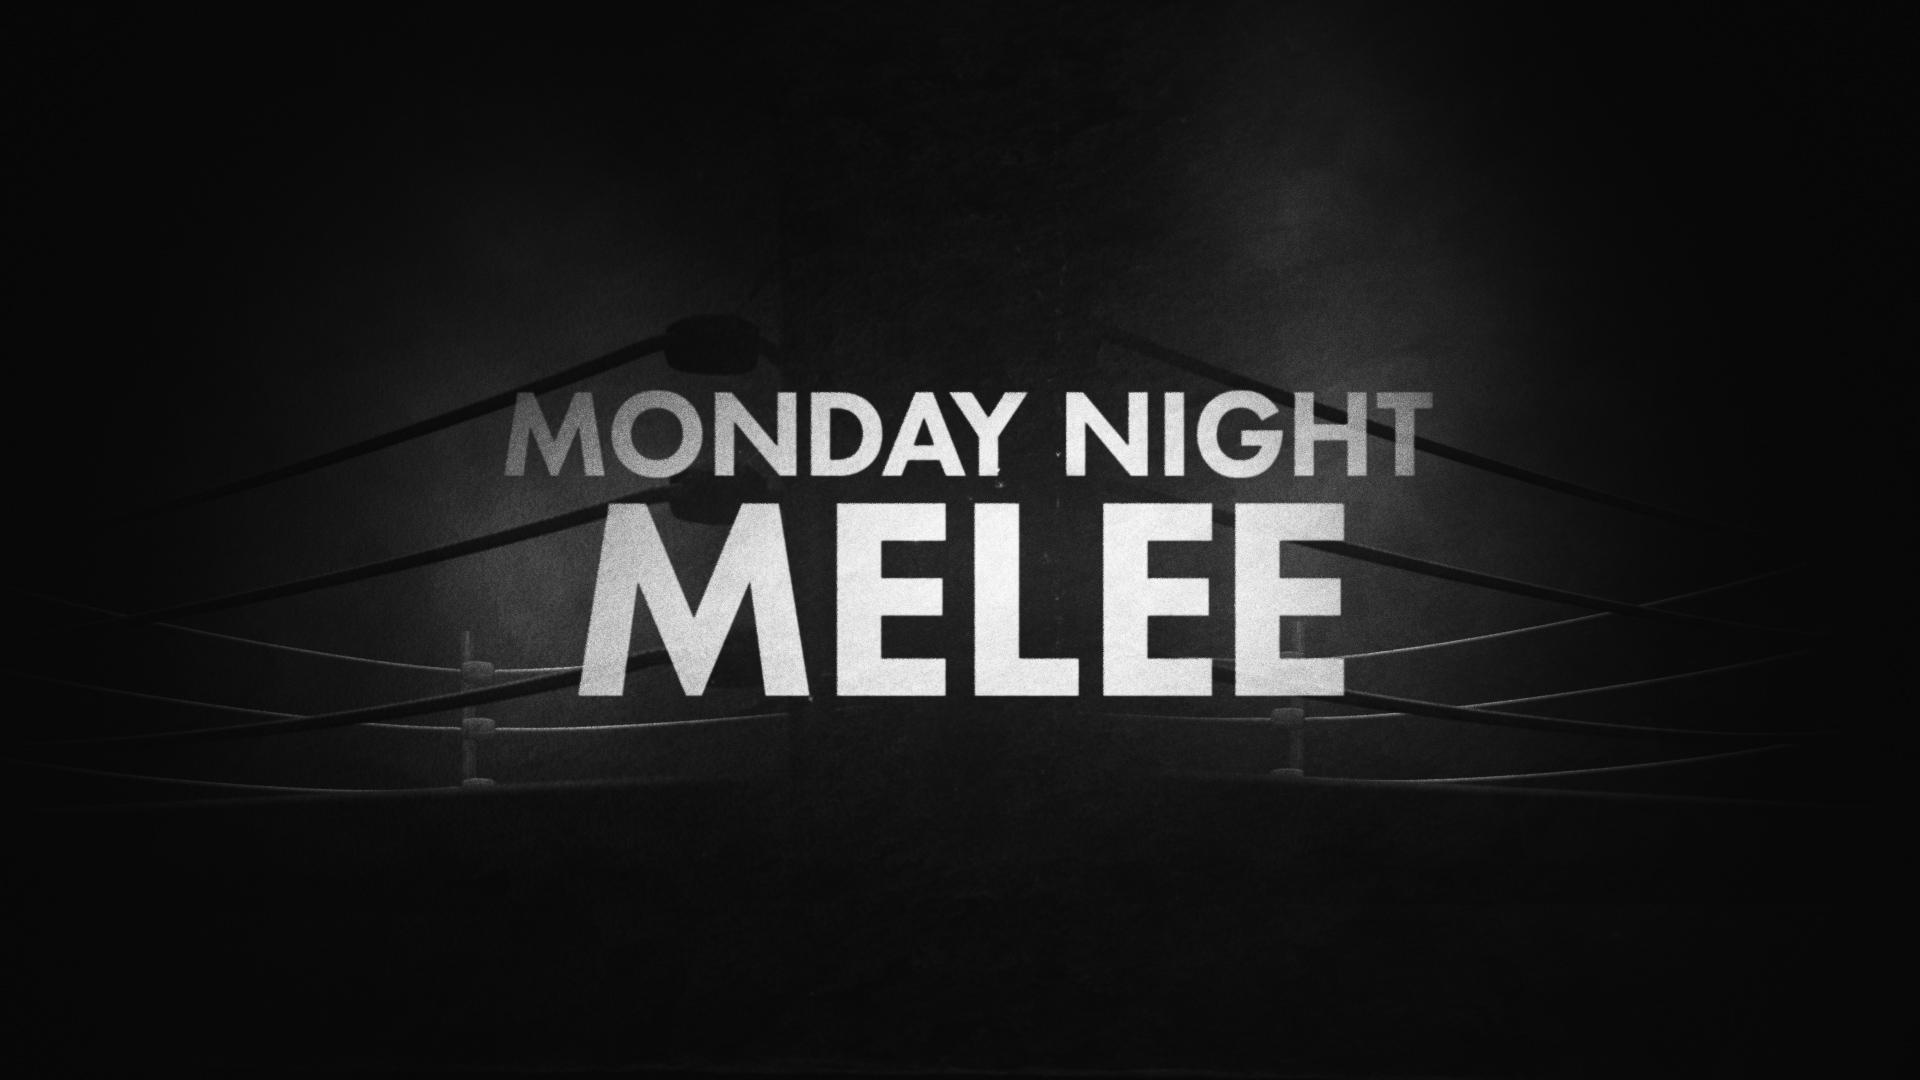 BLM_SZ_Card_MondayNightMelee_ac_01.jpg